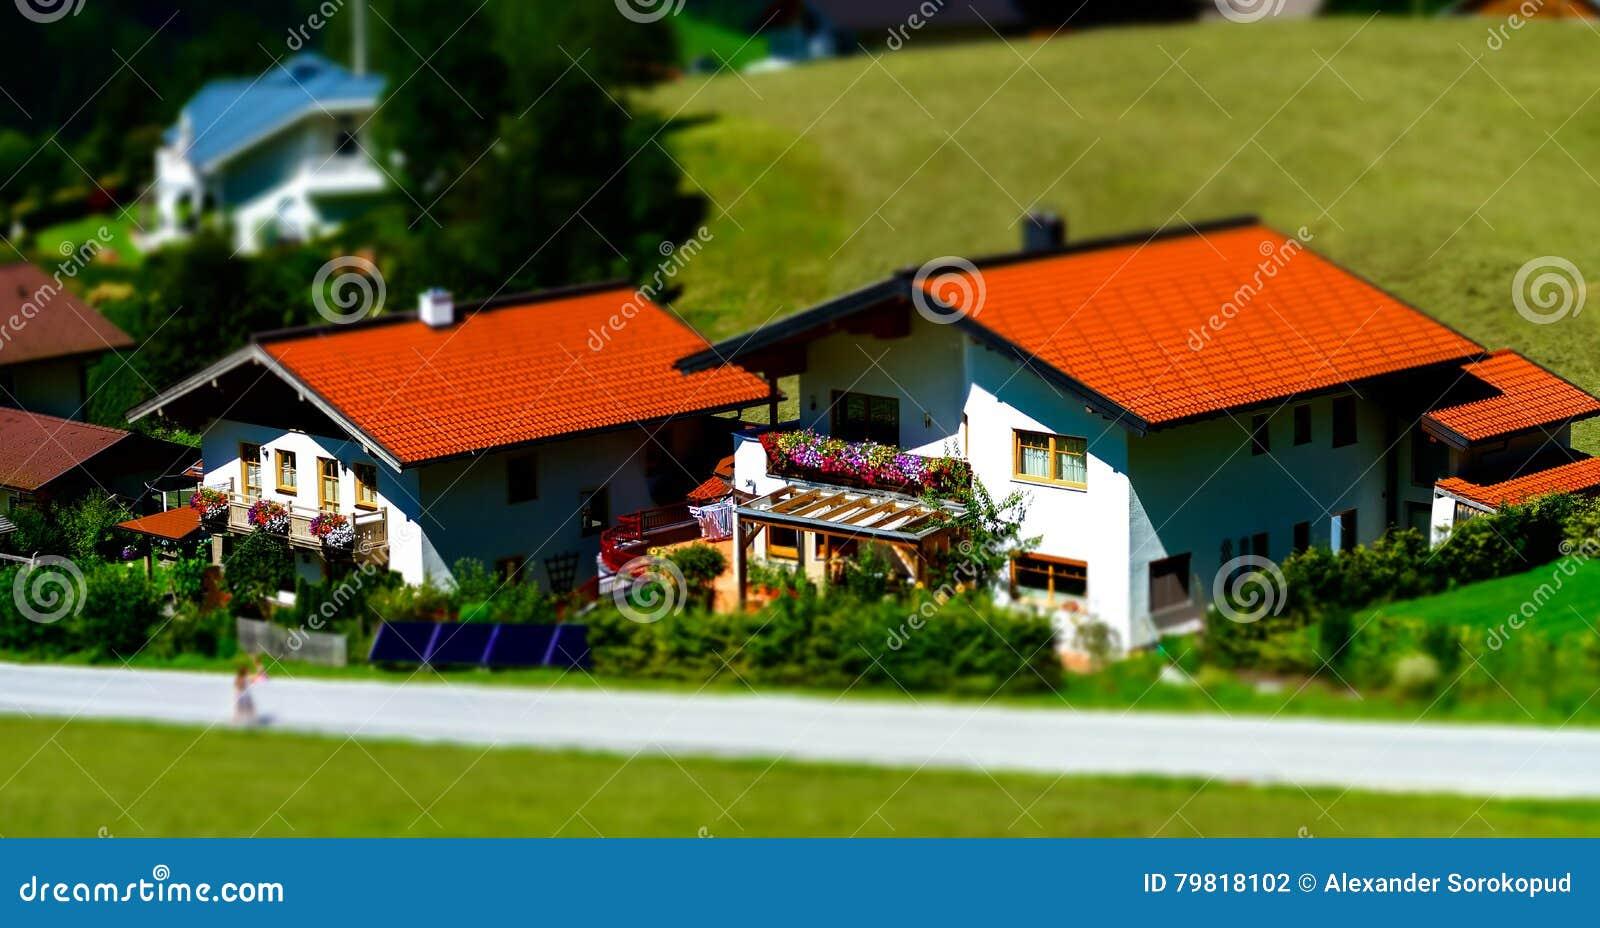 Casa de hóspedes no lugar calmo, nas montanhas e na natureza, Áustria